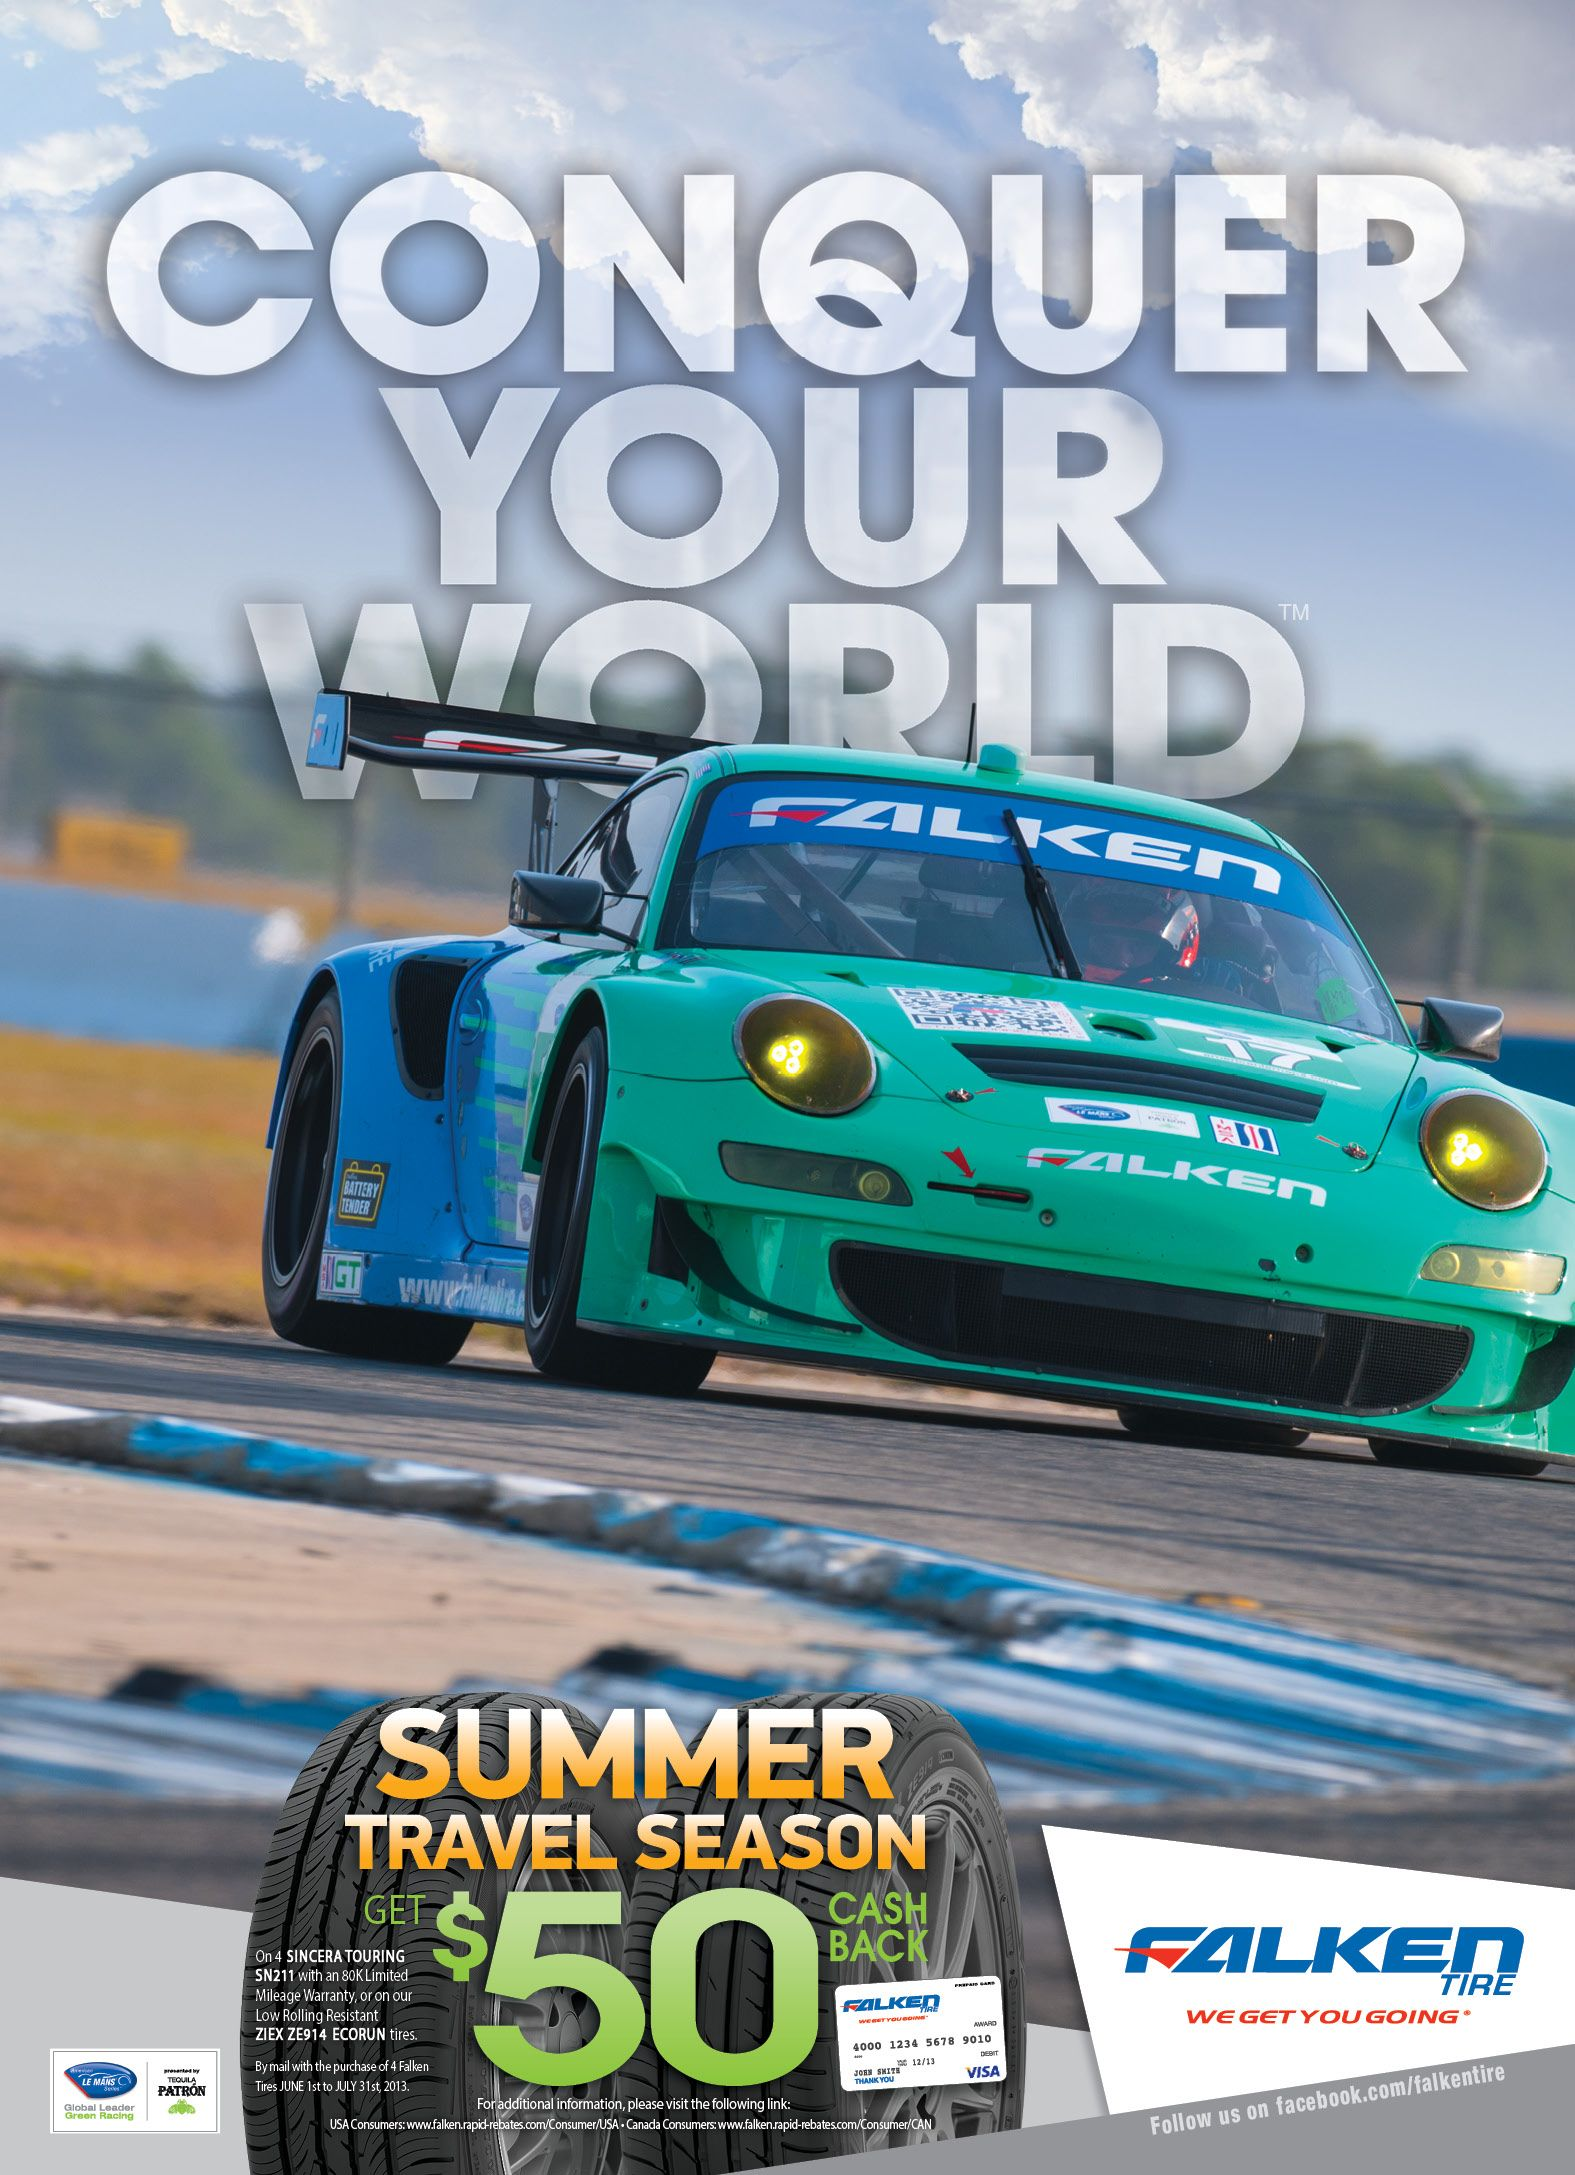 Falken Tire Automobile Magazine Ad Conquer Your World | Falken ...